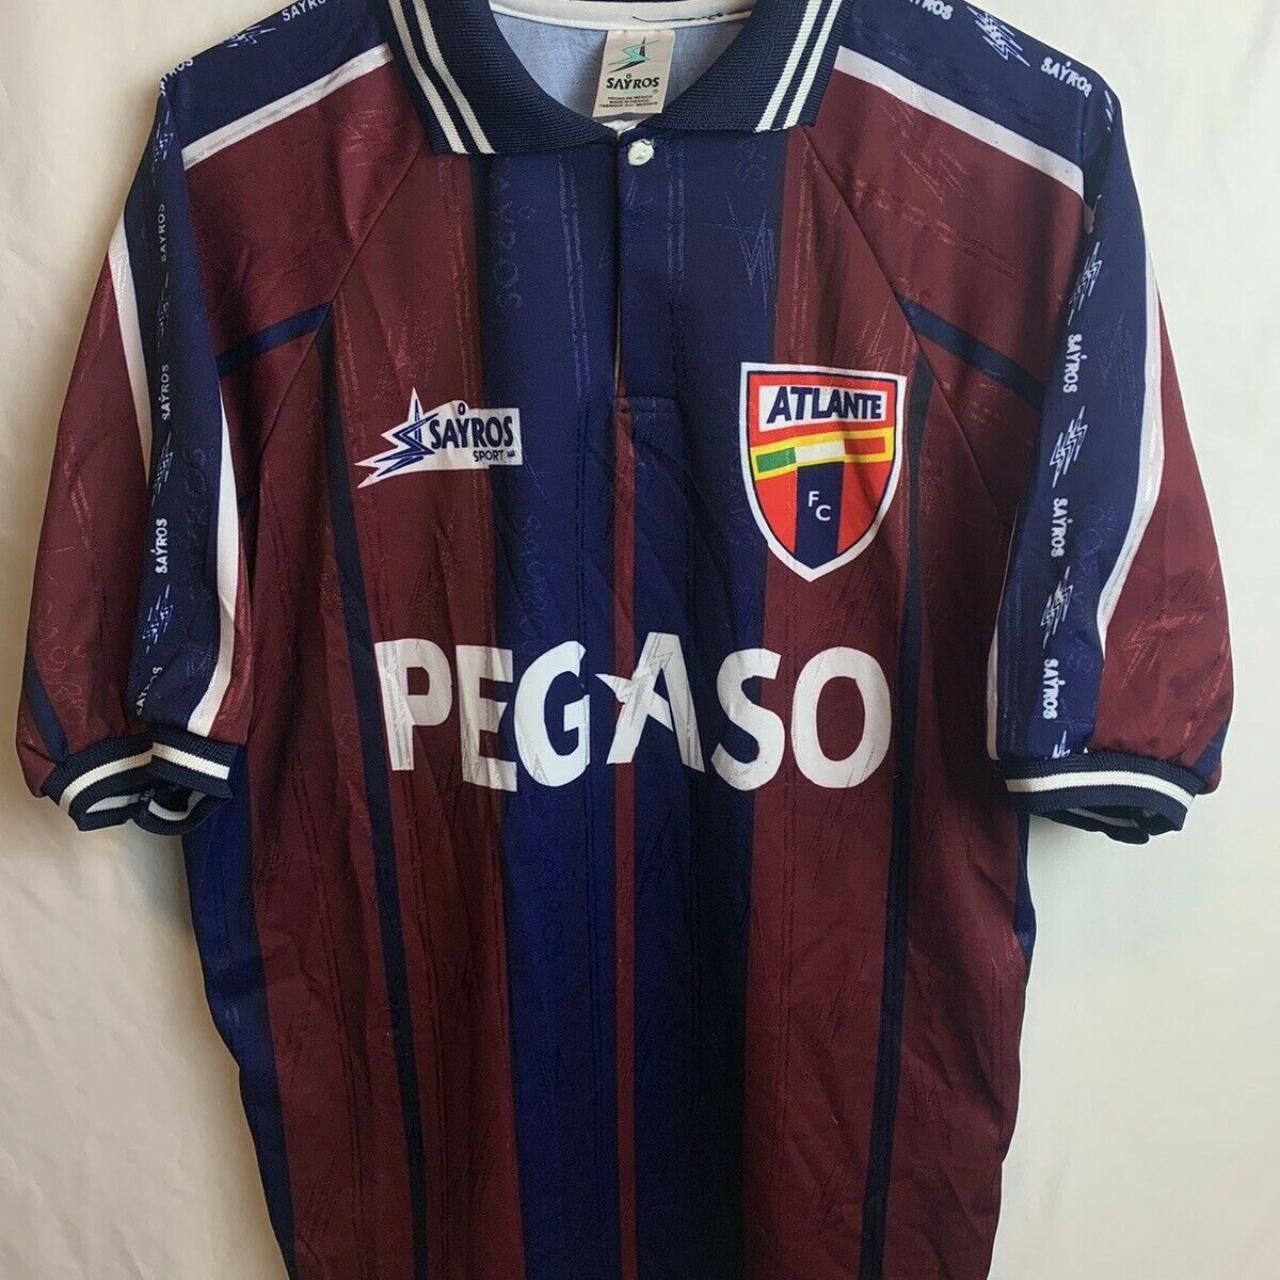 Product Image 1 - Authentic Sayros Atlante FC Pegaso